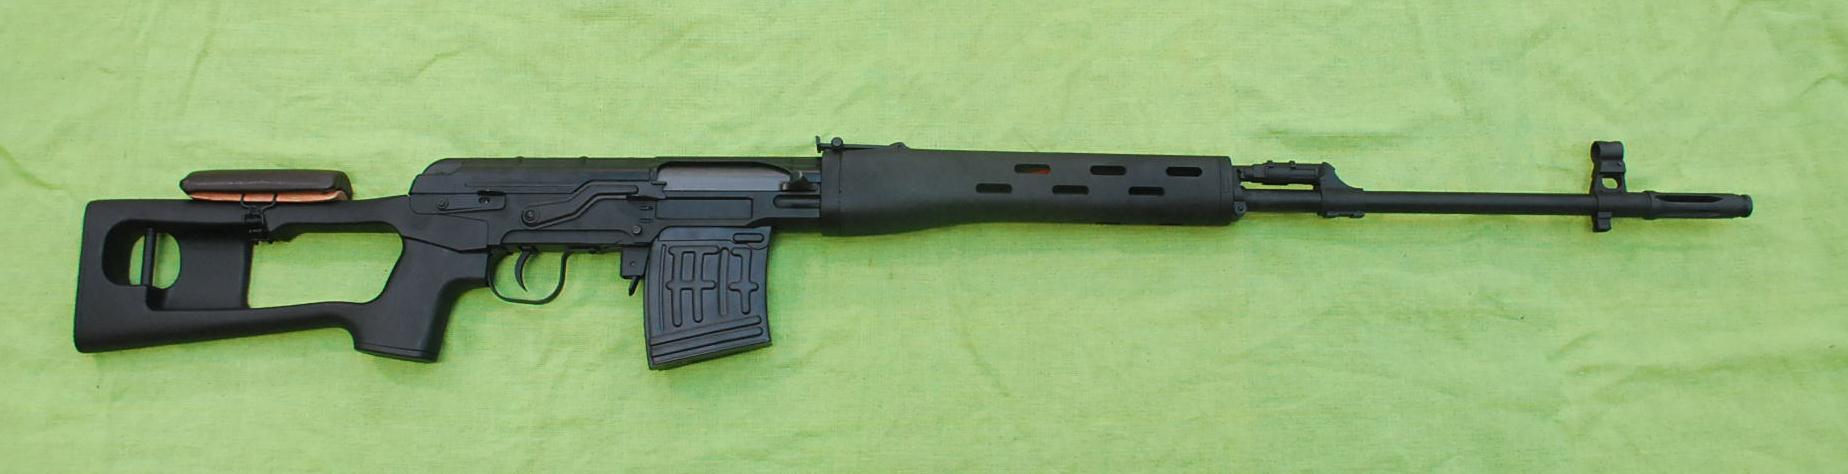 A&K製 SVD ドラグノフ 電動ライフル(セミフル切り替え可)